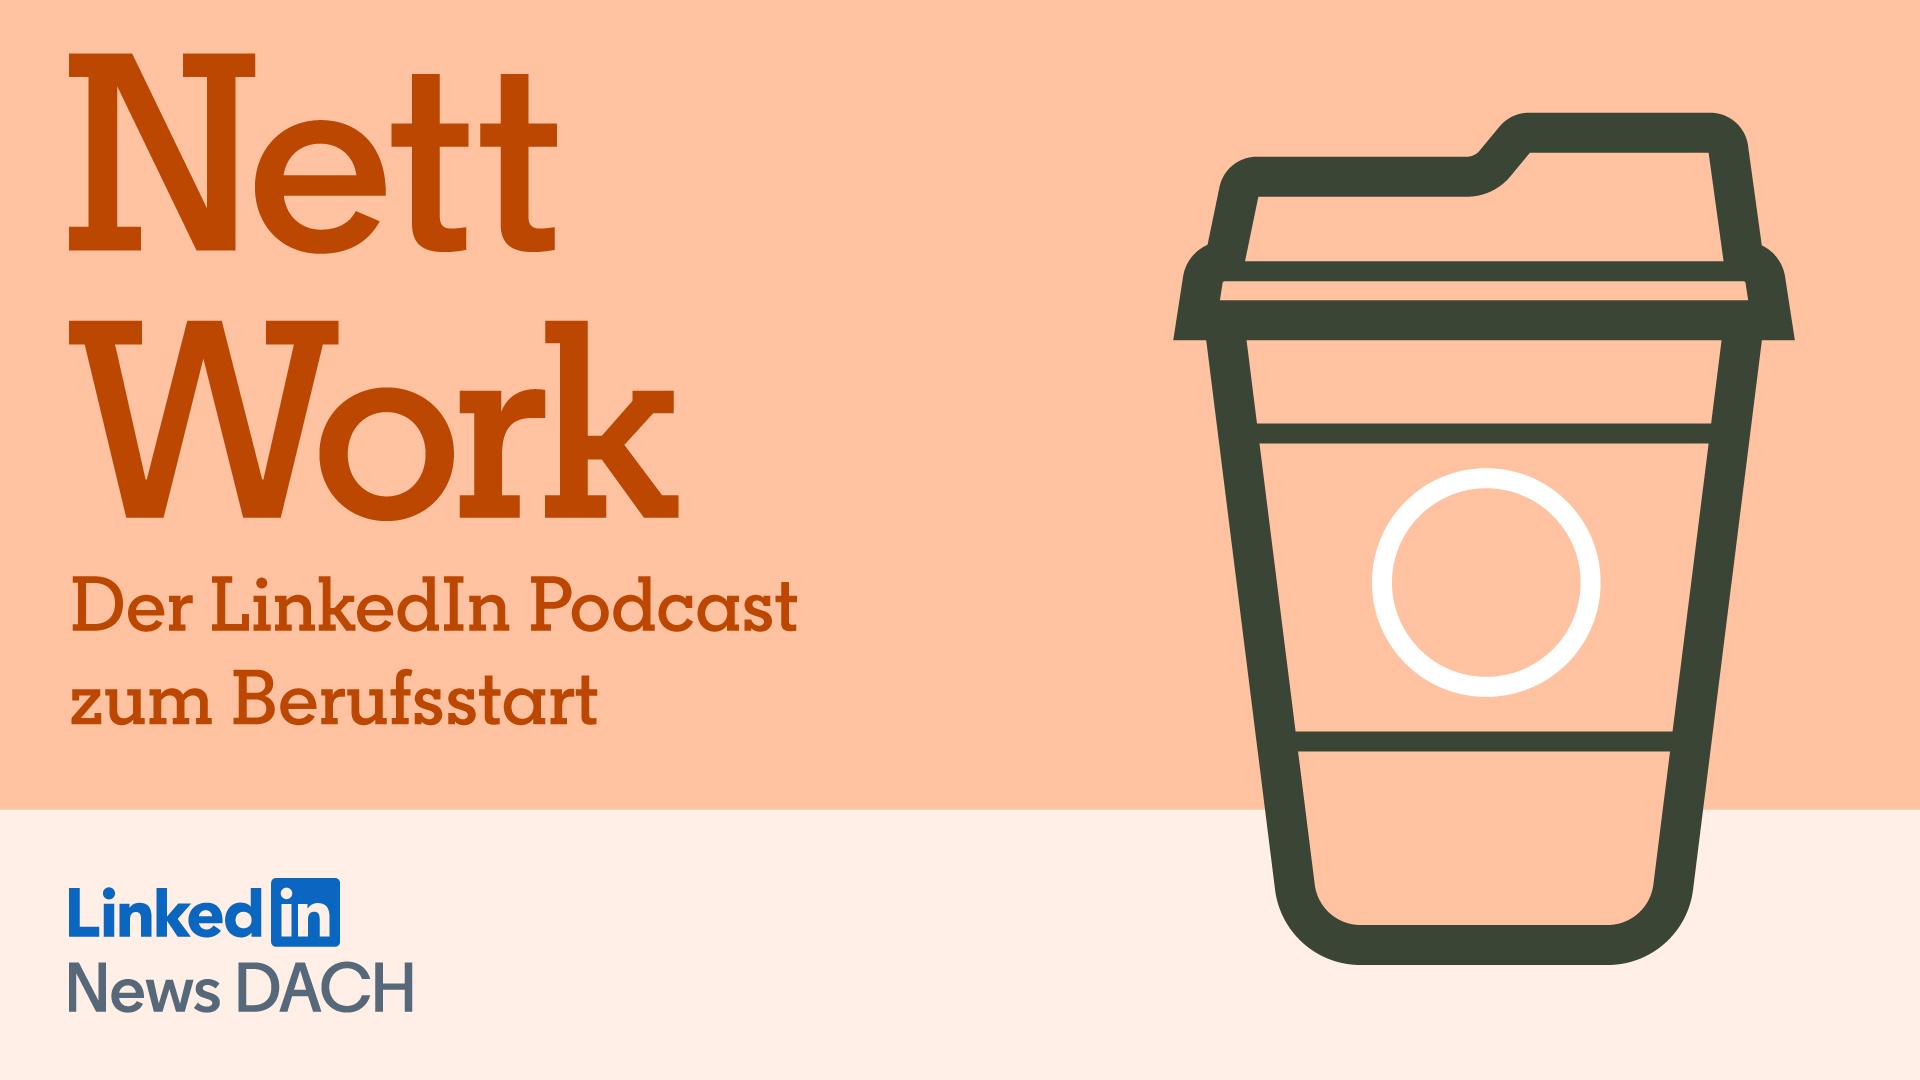 Nett Work: Der LinkedIn Podcast zum Berufsstart